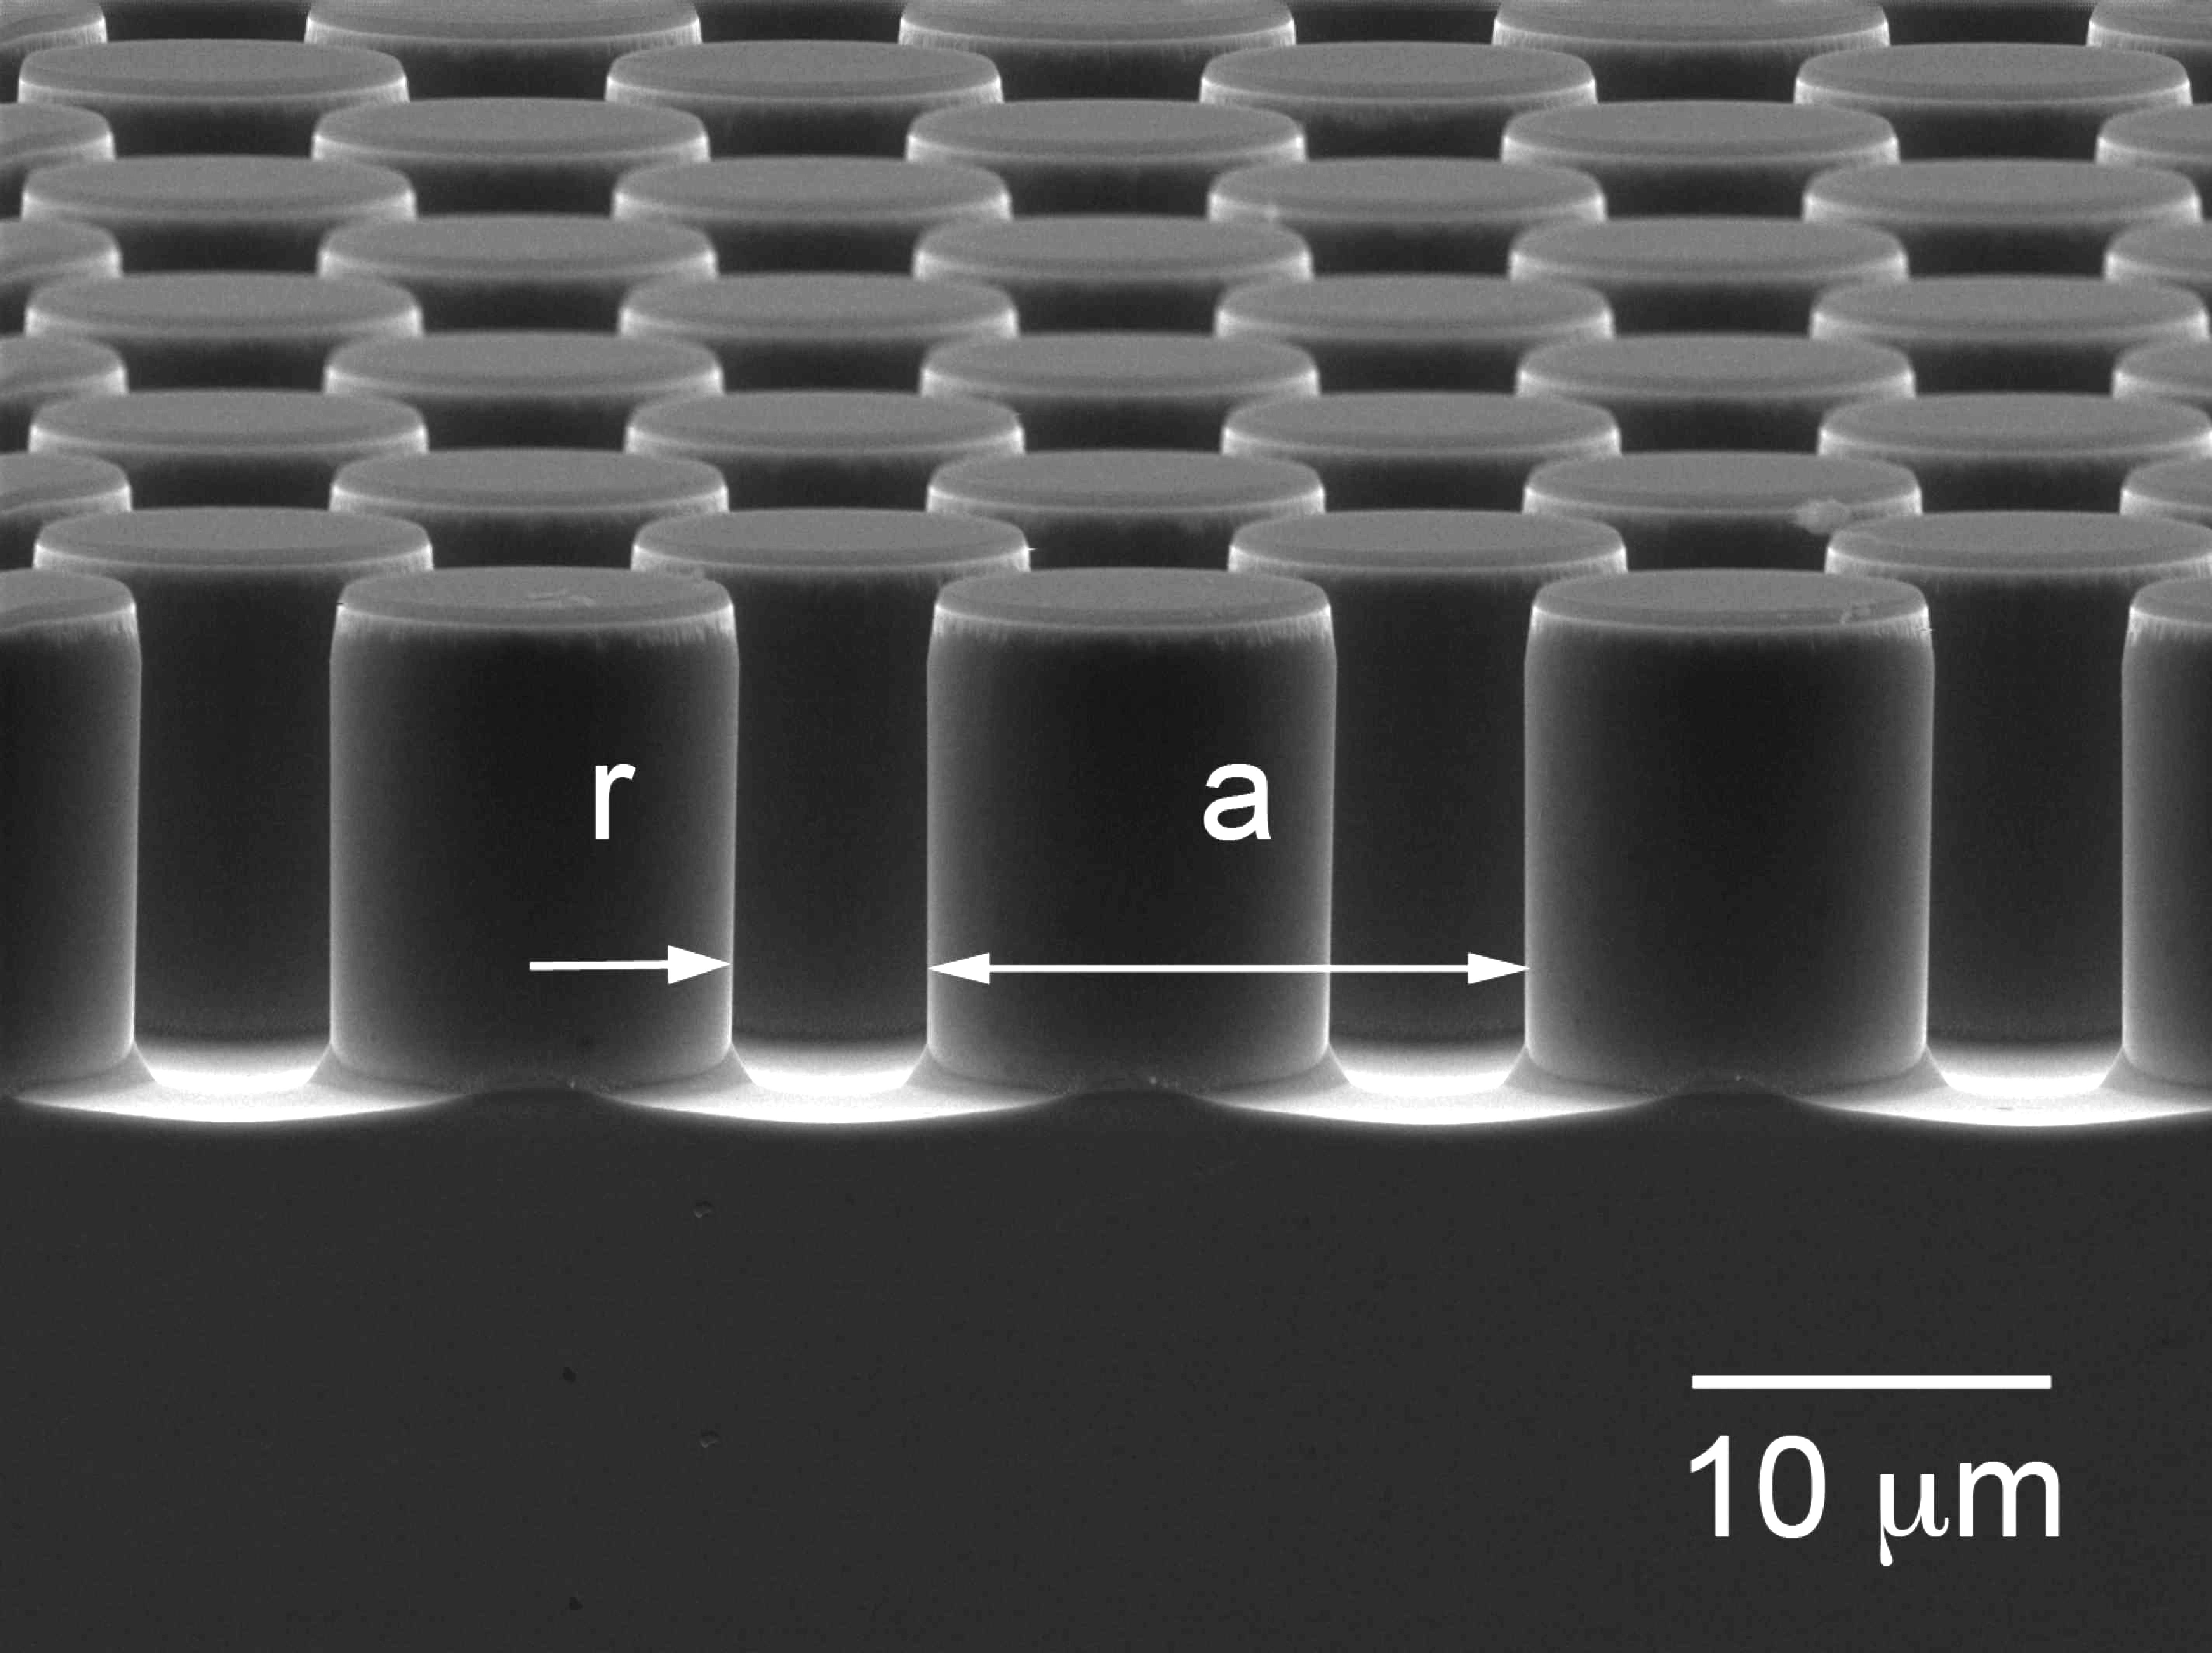 Photonic crystal nanolaser biosensor simplifies DNA detection